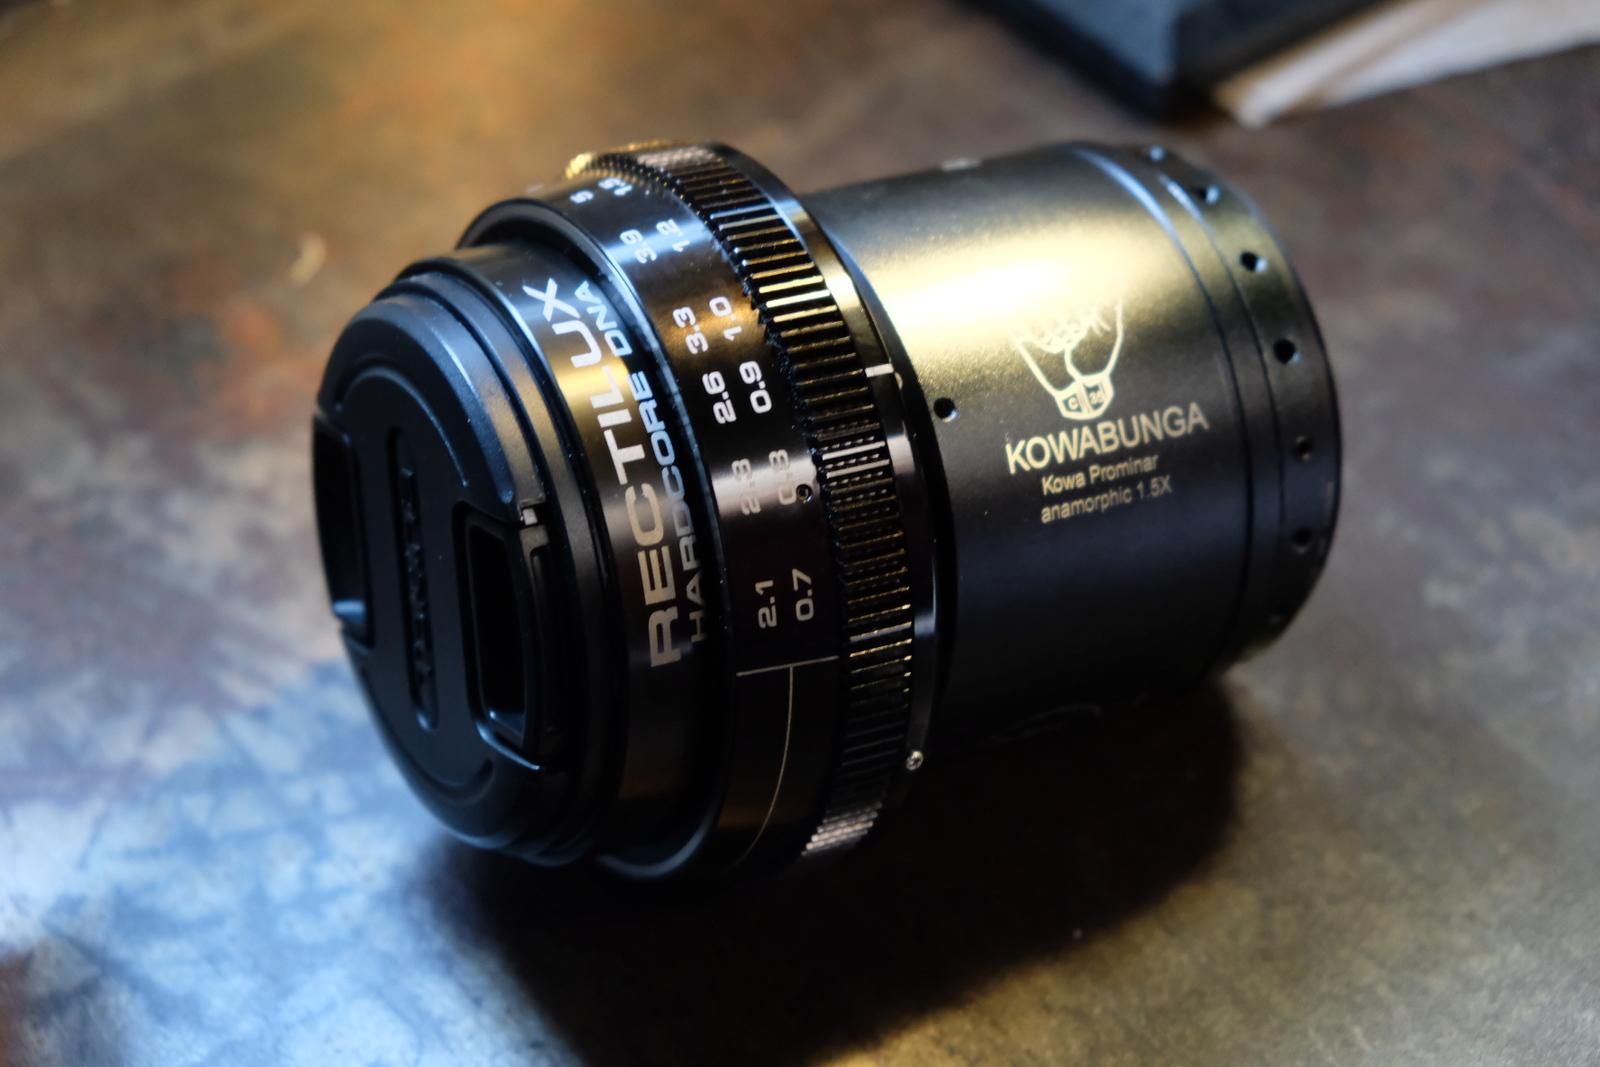 For Sale: Kowa Prominar C35 1 5x Anamorphic Lens Kit | ShareGrid